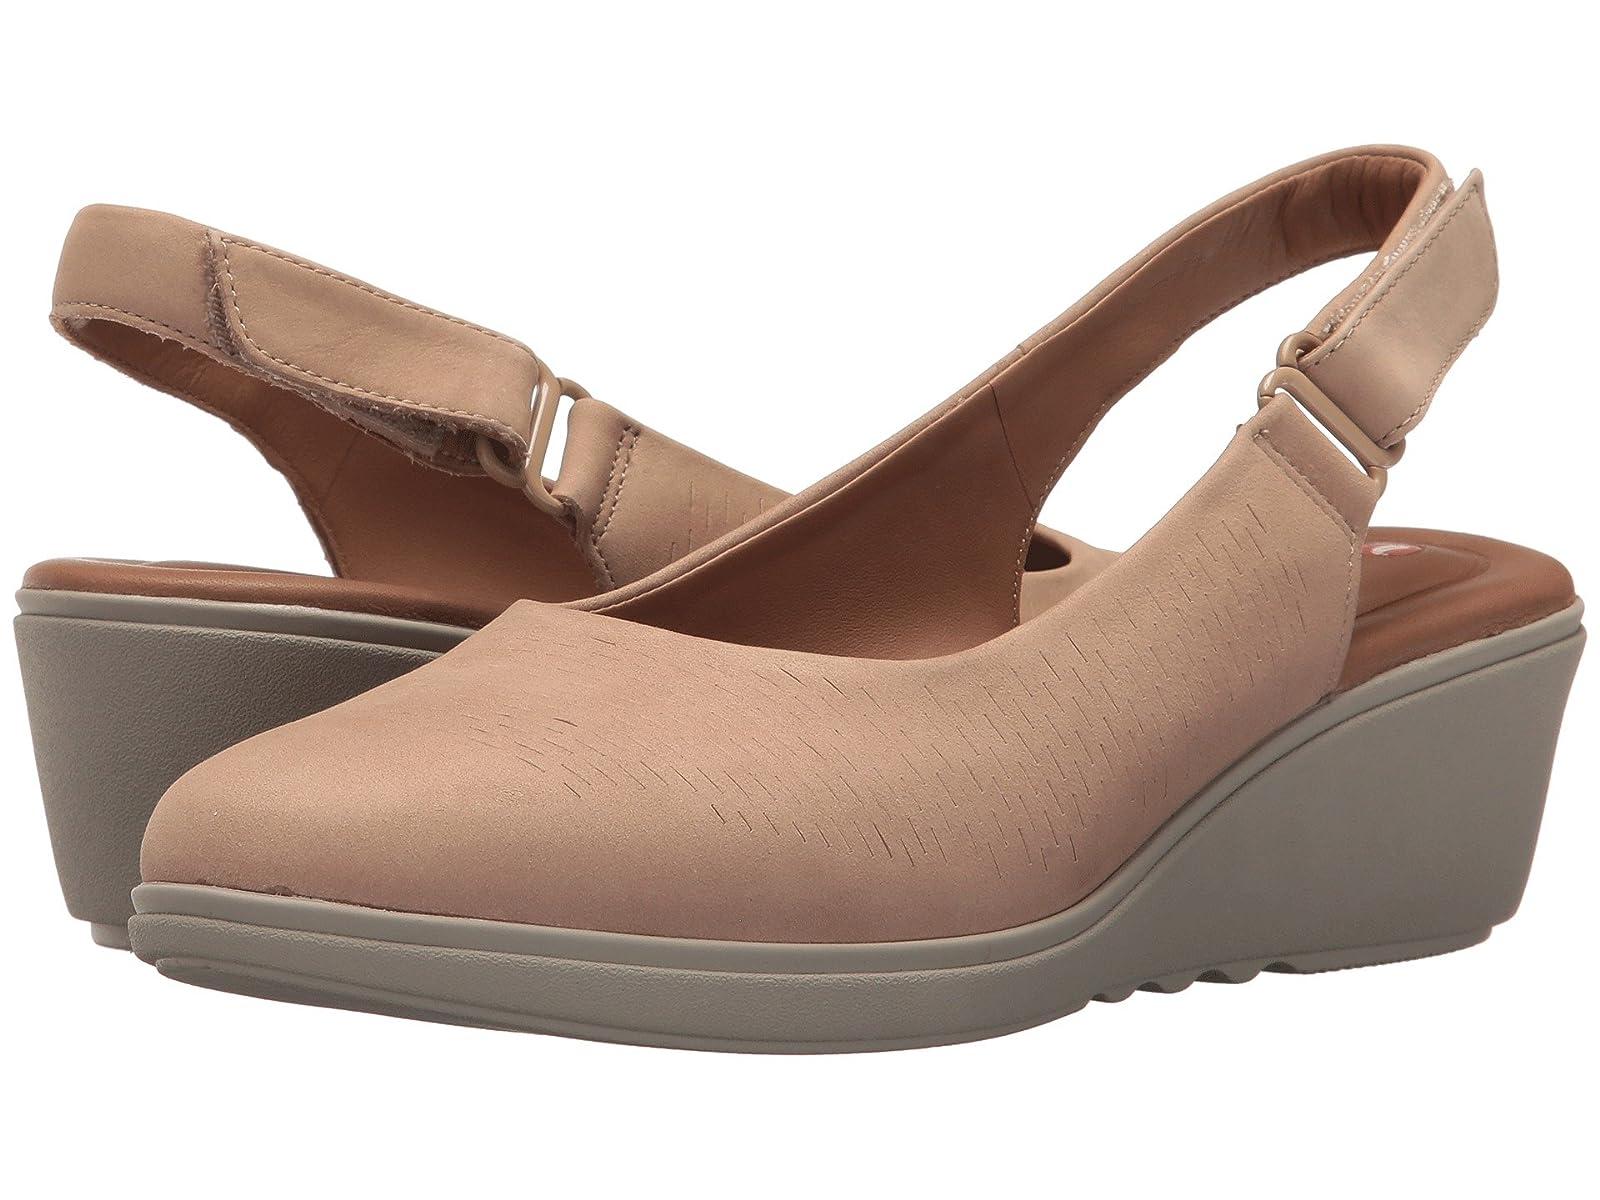 Clarks Un Tallara RaeCheap and distinctive eye-catching shoes